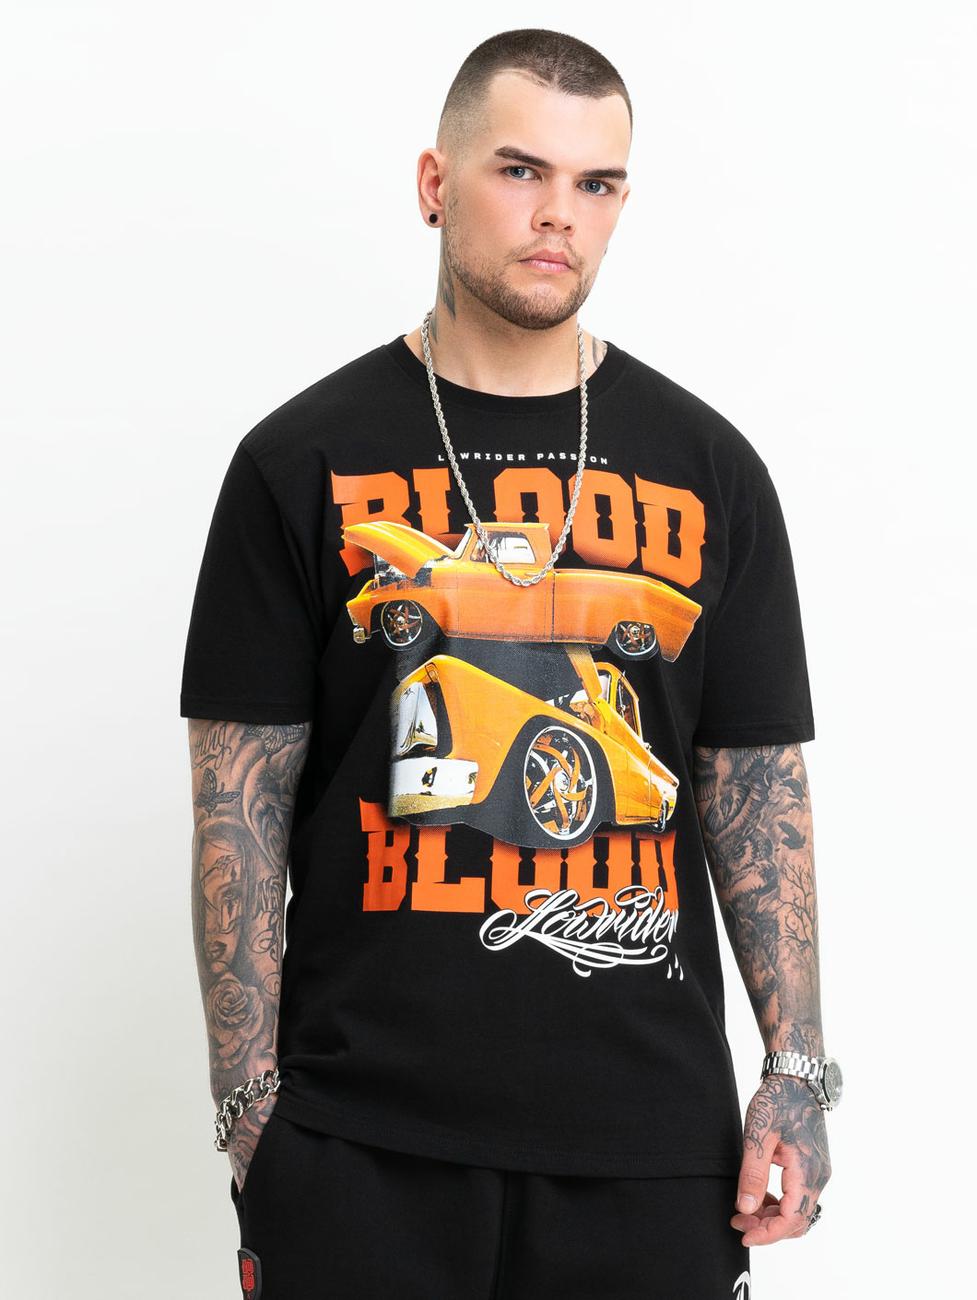 Blood In Blood Out Nizado T-Shirt 4XL